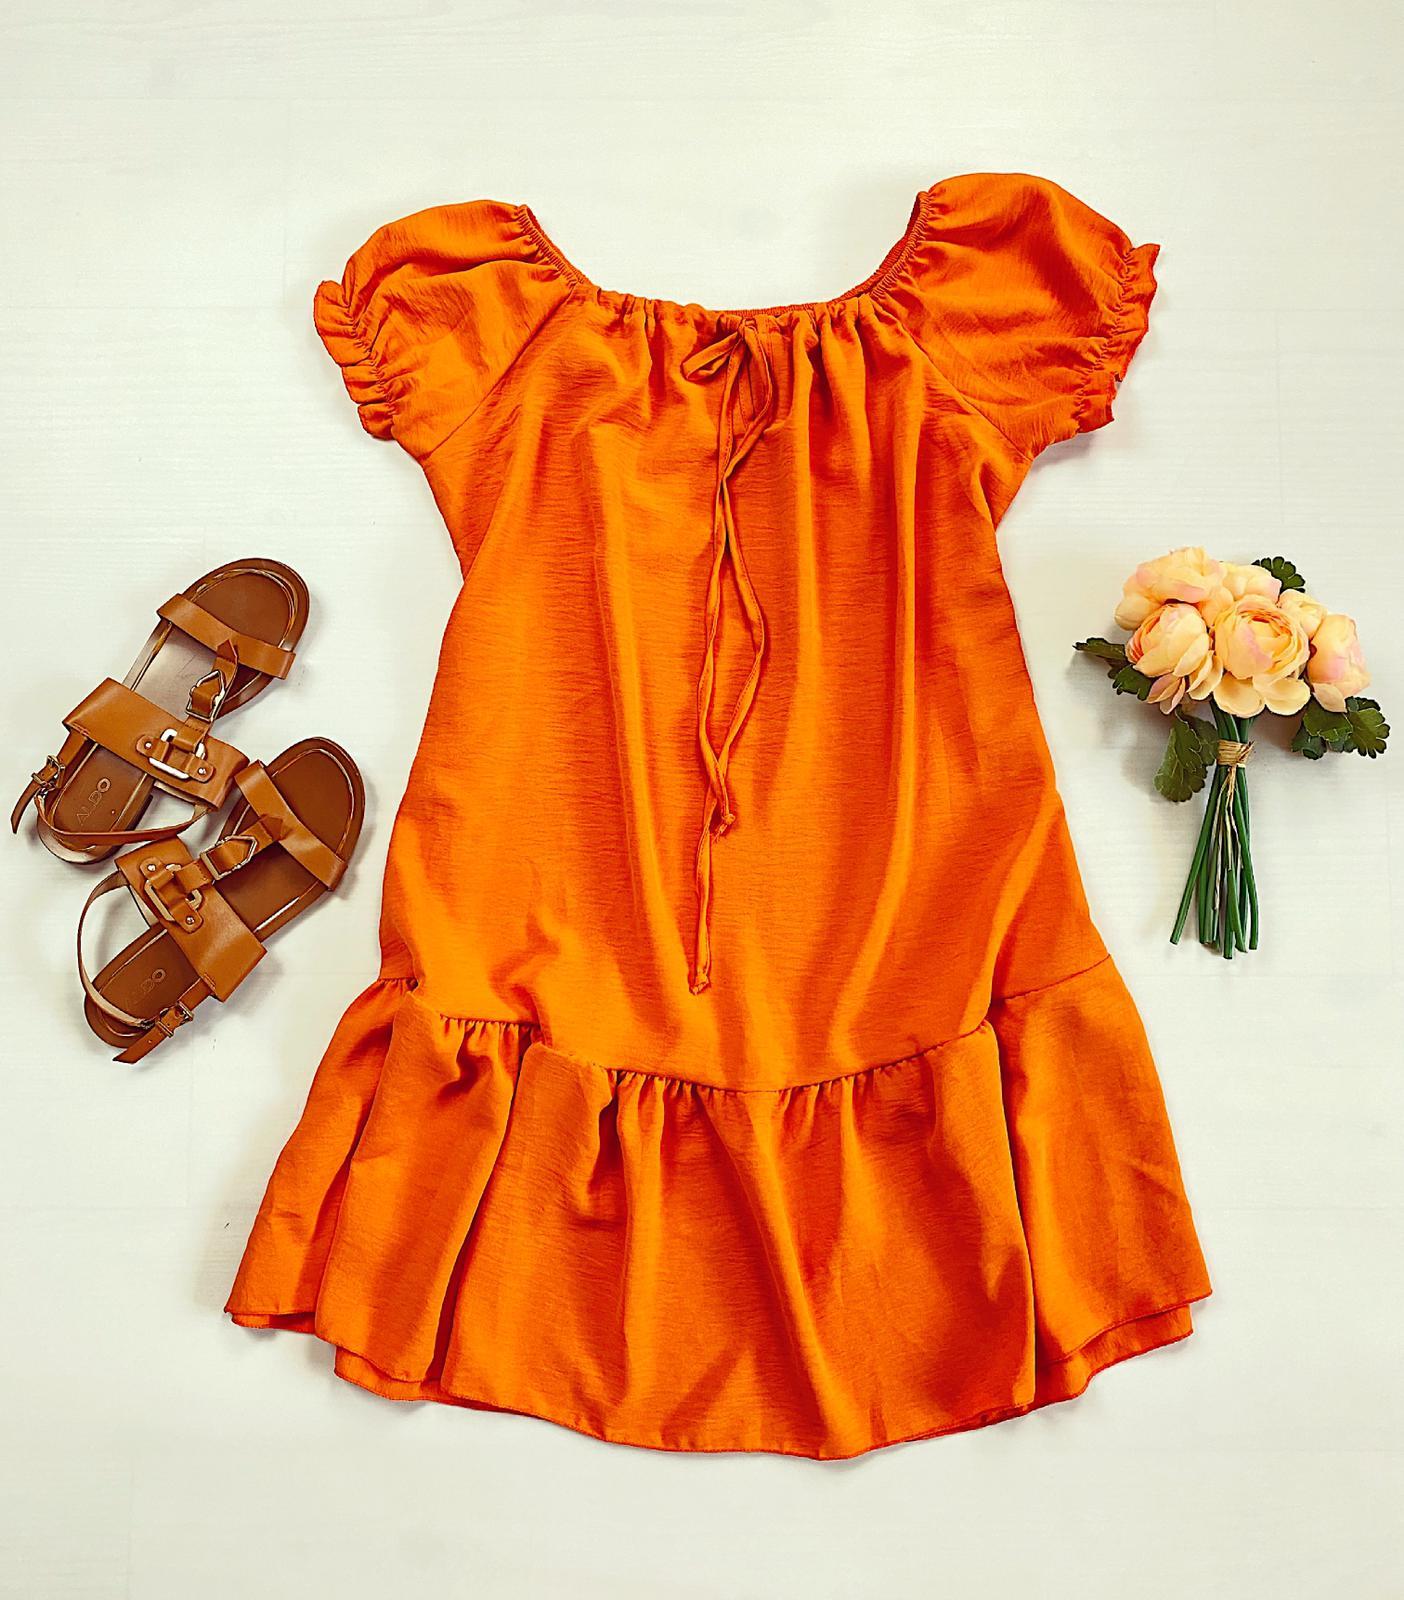 Rochie scurta portocalie de vara cu umeri bufanti